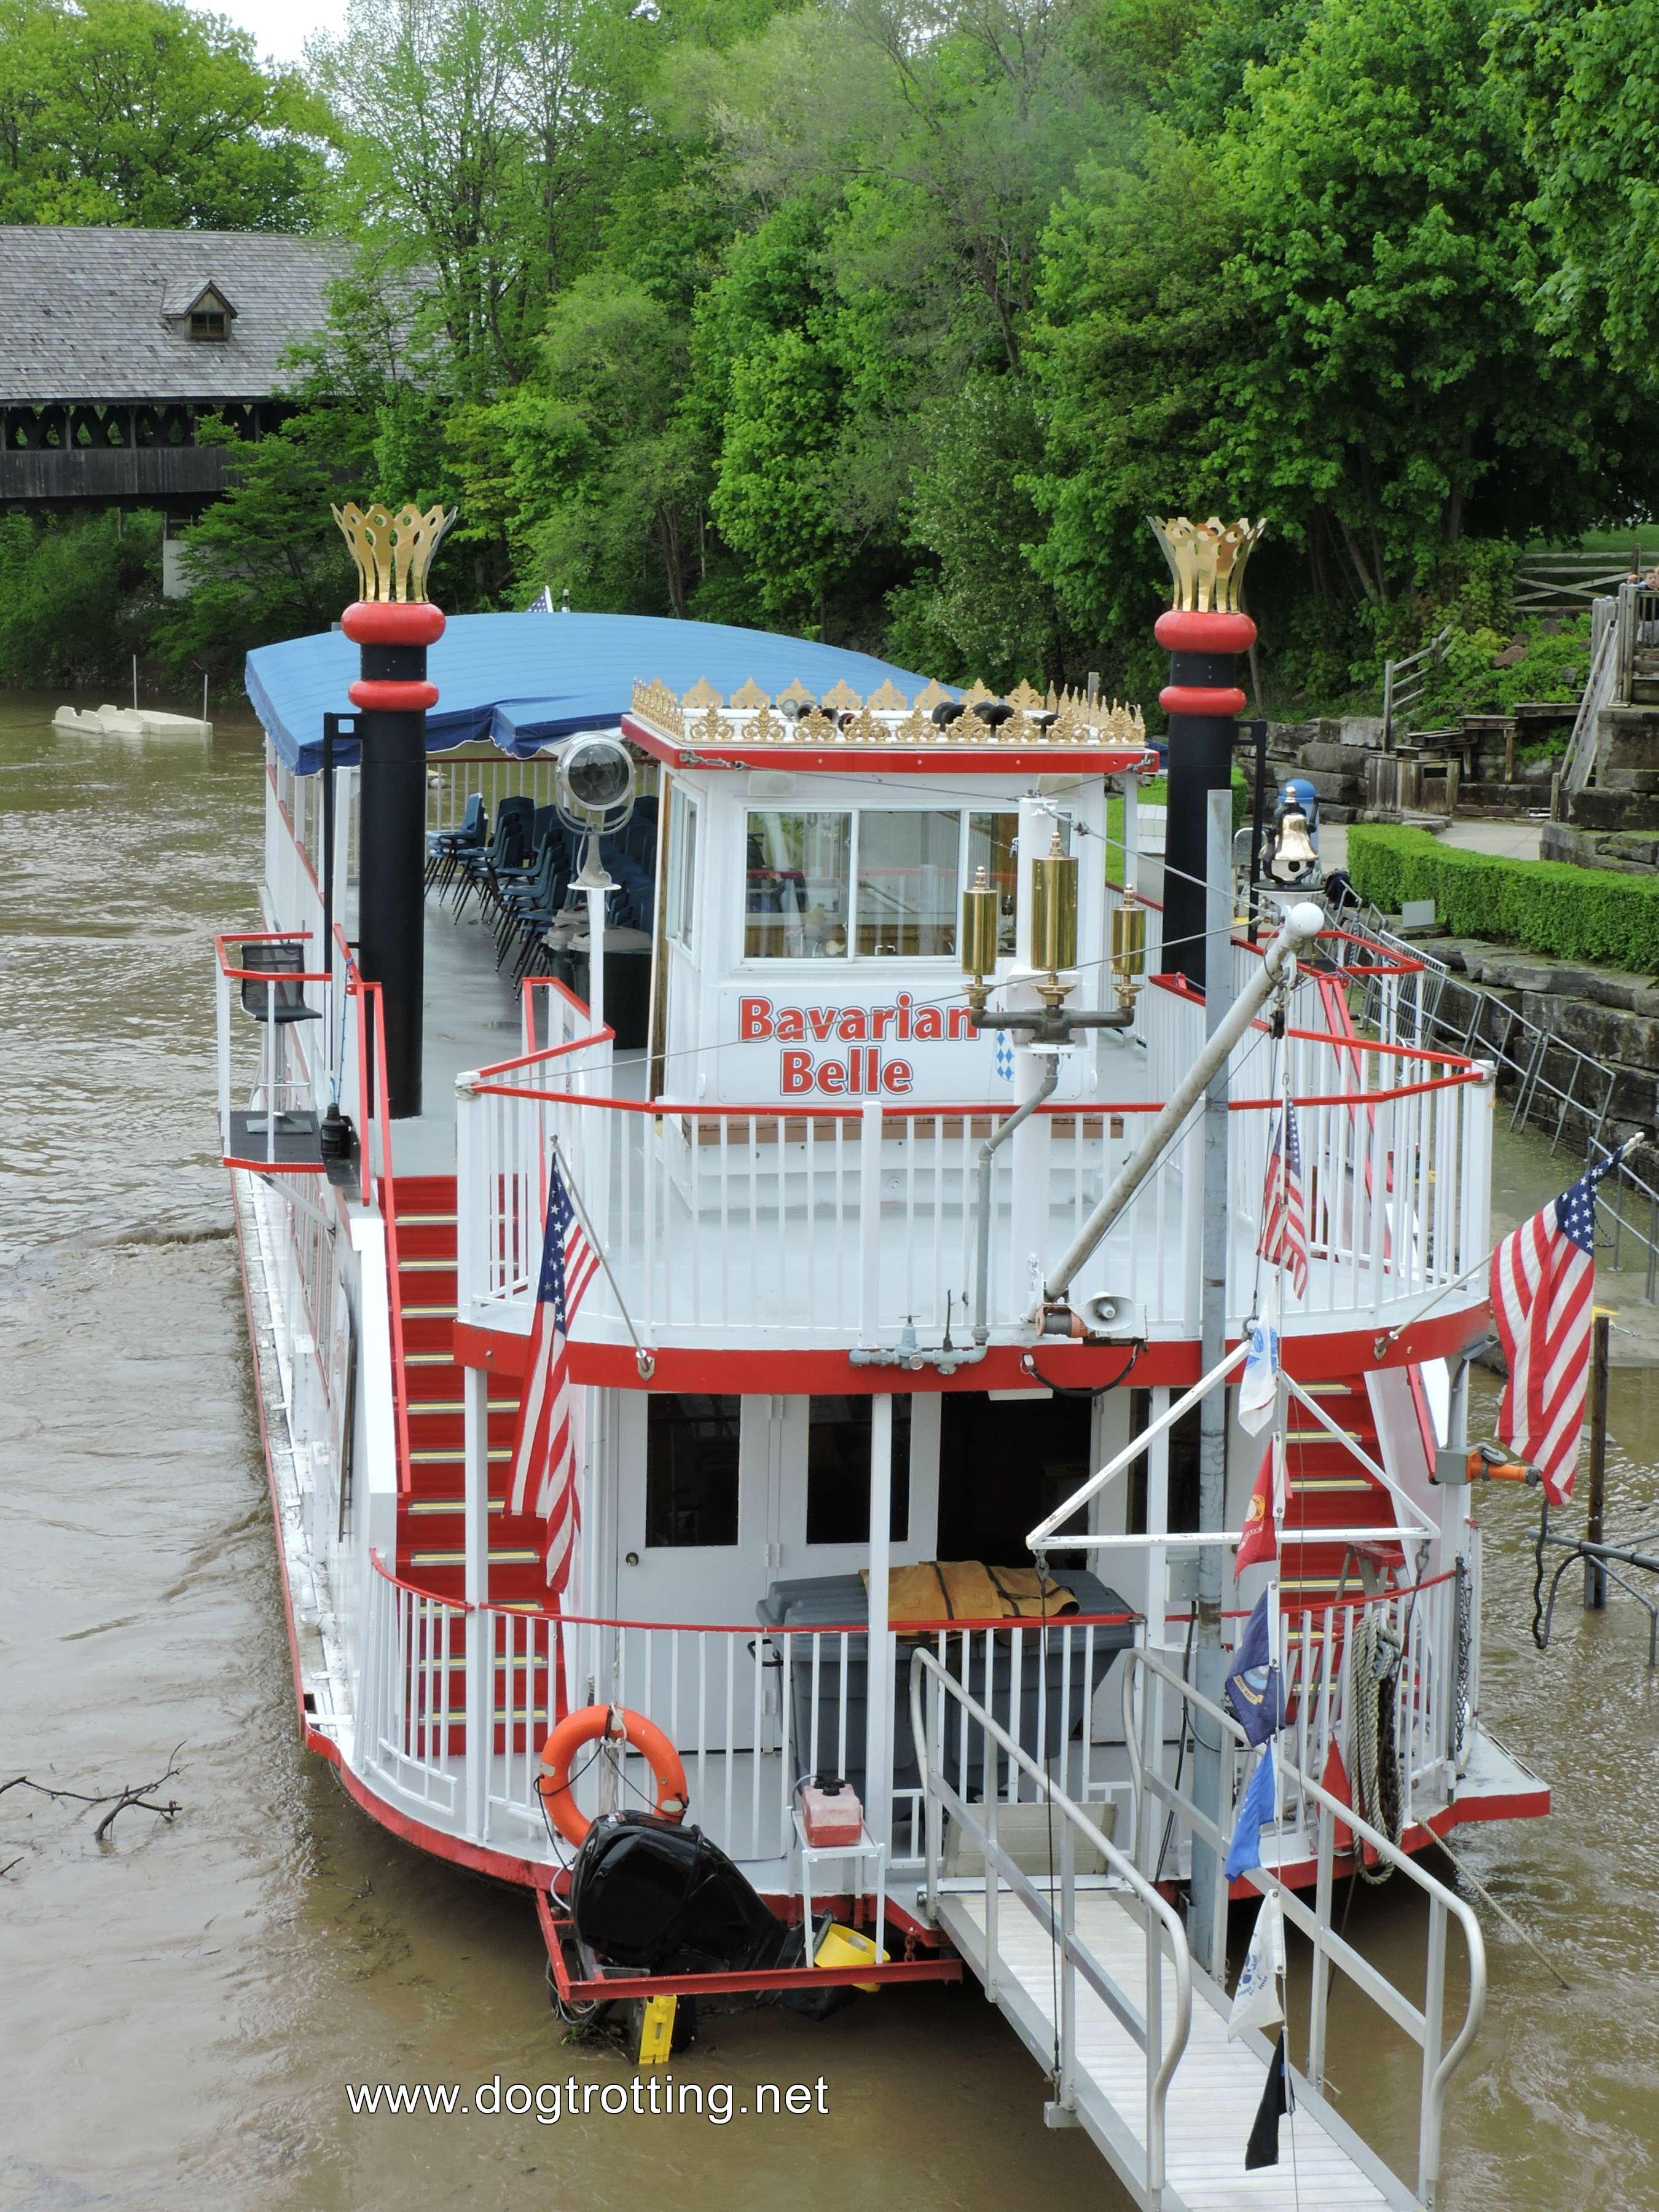 Bavarian Belle River Boat, Frankenmuth, Michingan